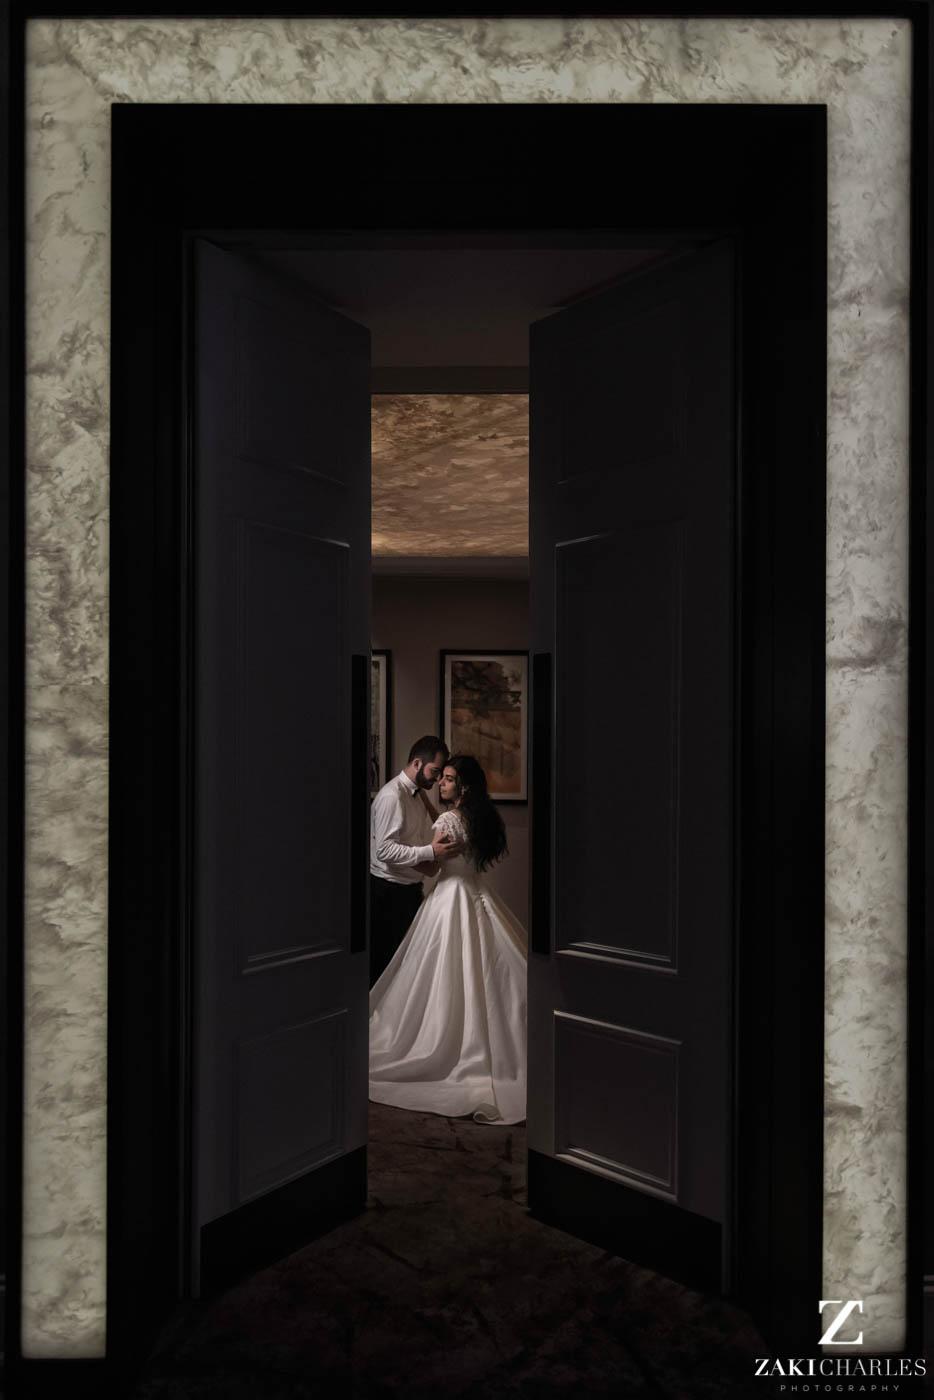 Fine art wedding photography at Marriott Hotel Regents Park 5